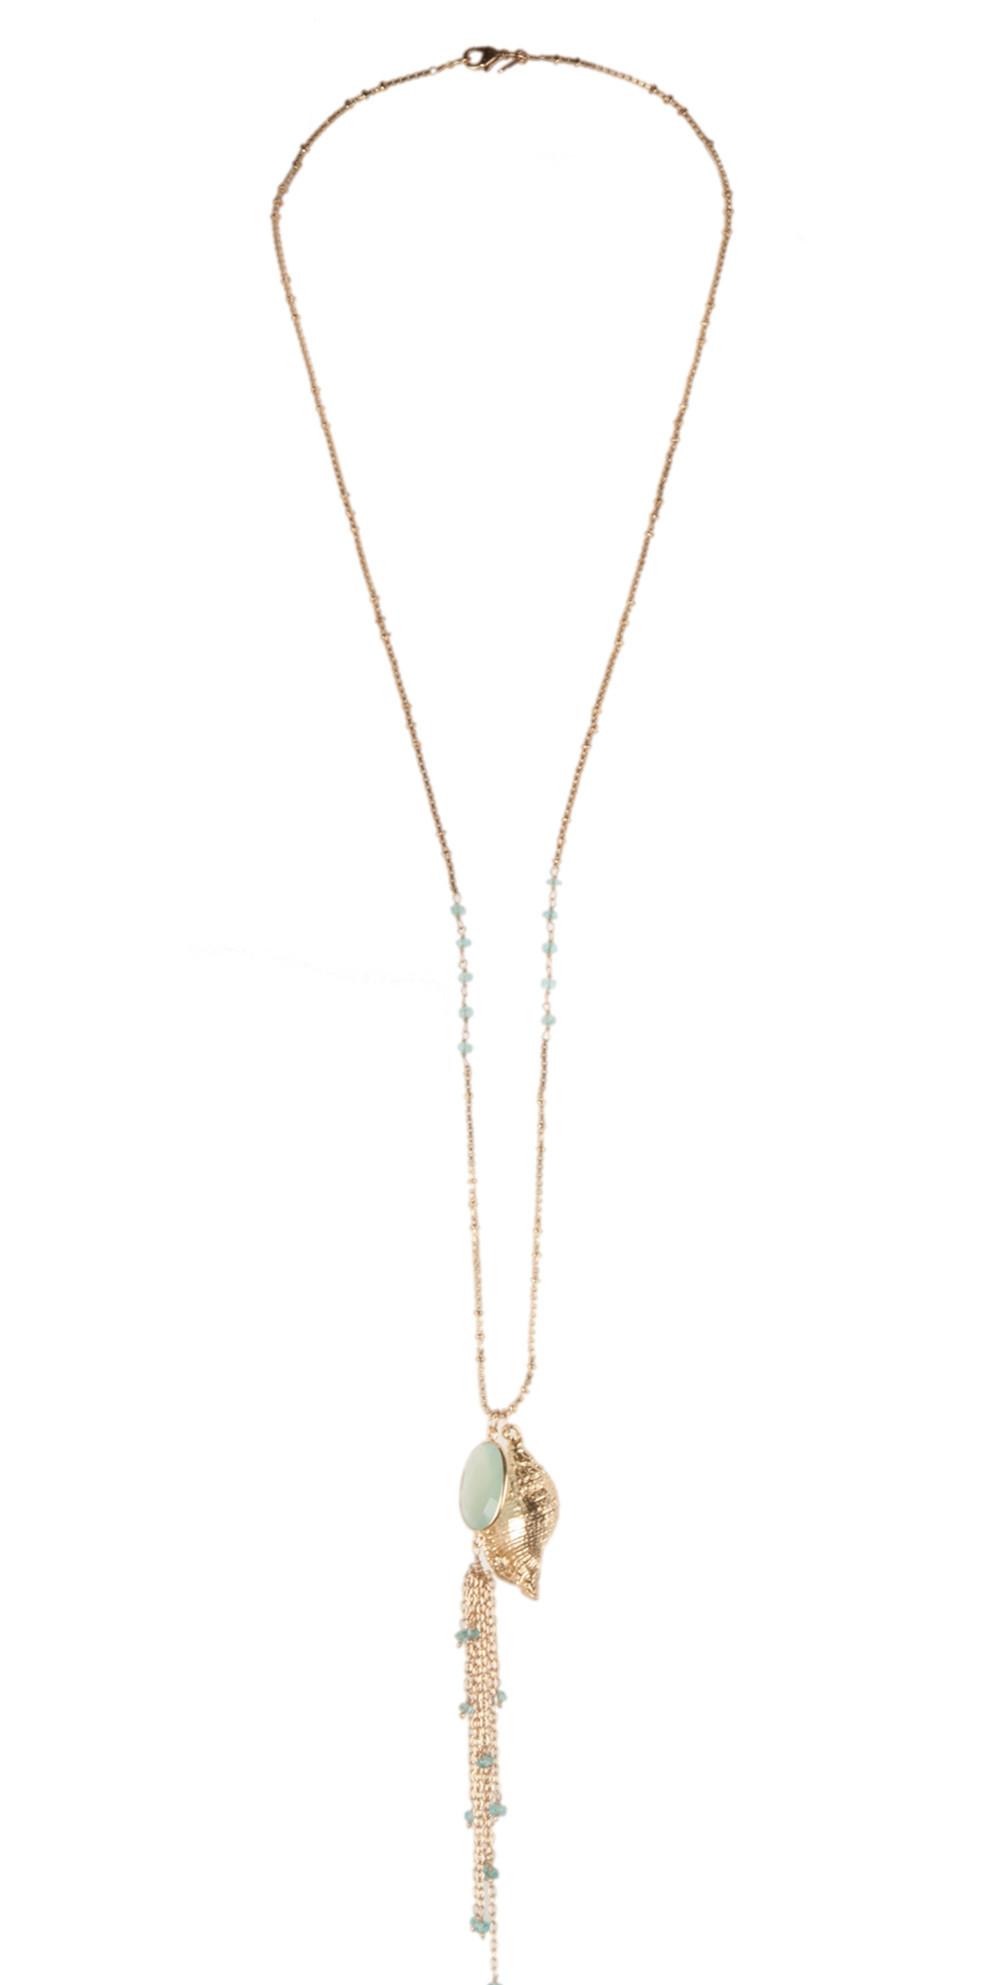 Aqua Chalcedony Necklace With Sea Shell And Flourite main image